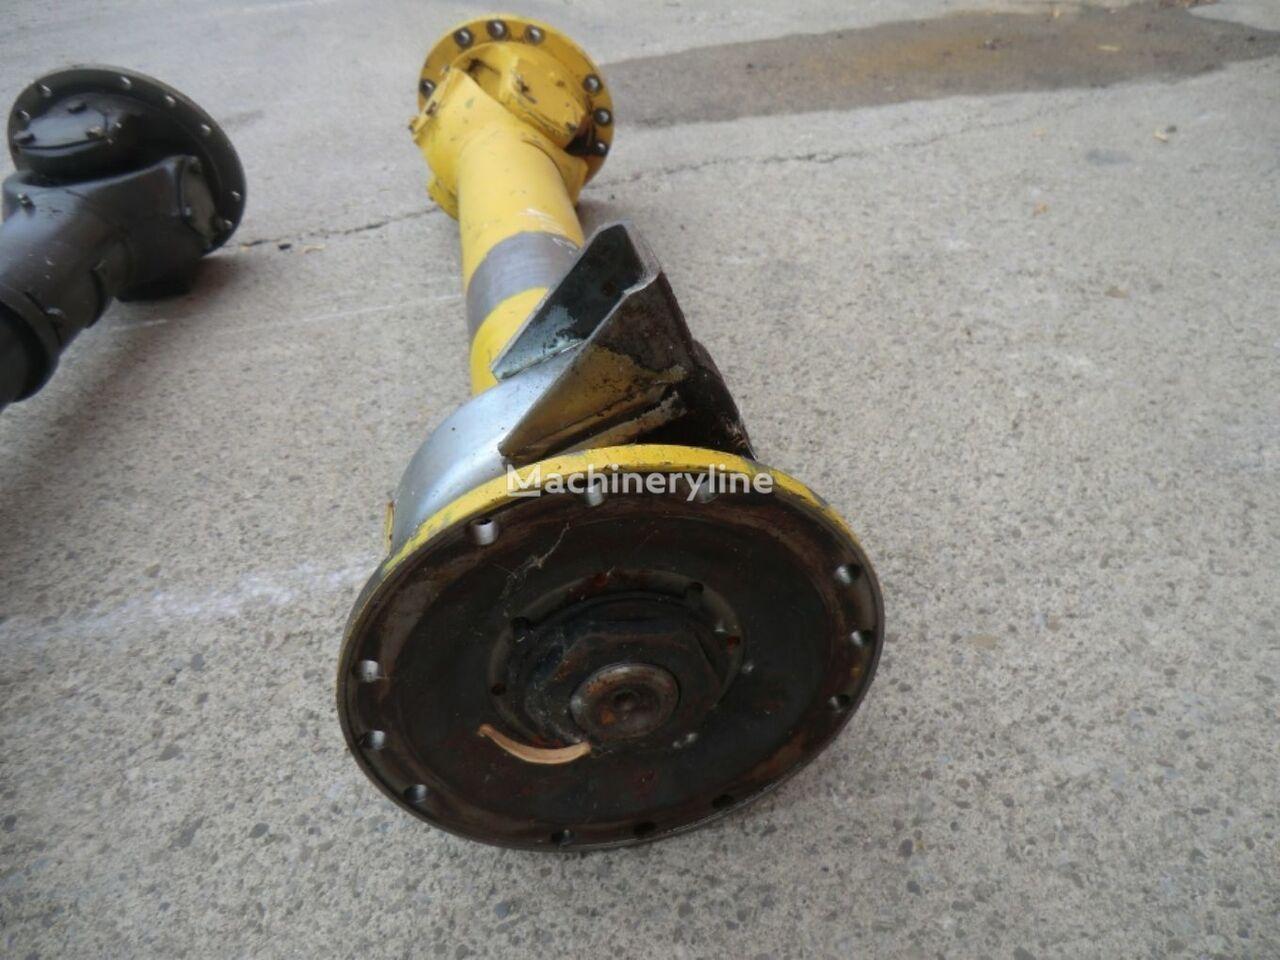 PROPELLER SHAFT half-axle for VOLVO  L120C 11757 wheel loader